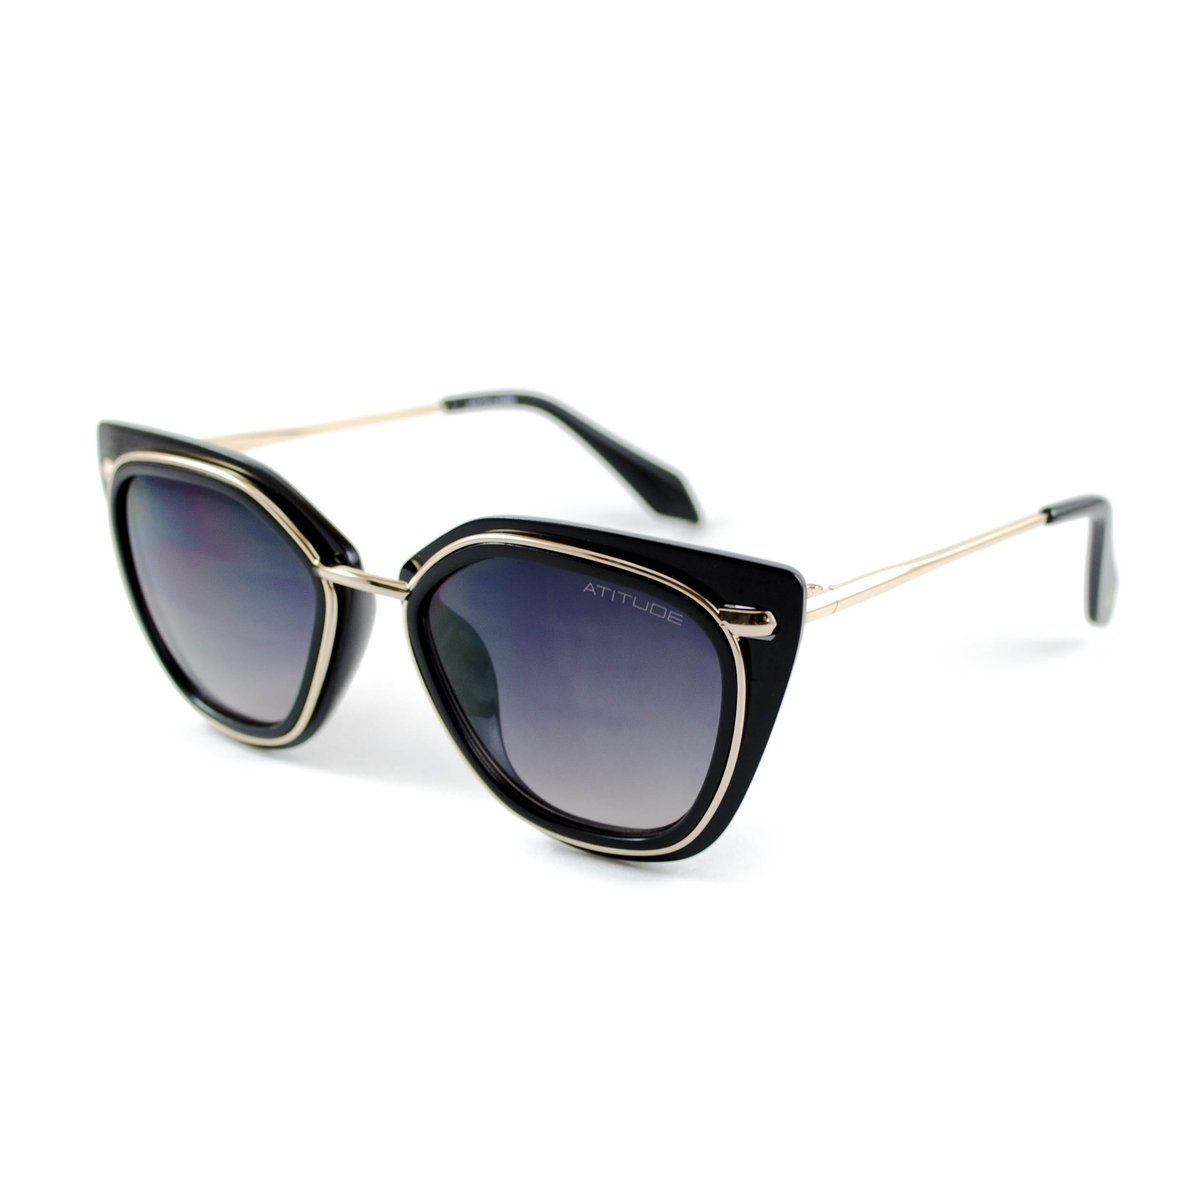 Óculos Atitude - AT5351 A01 - Compre Agora   Zattini 83f221ac2a